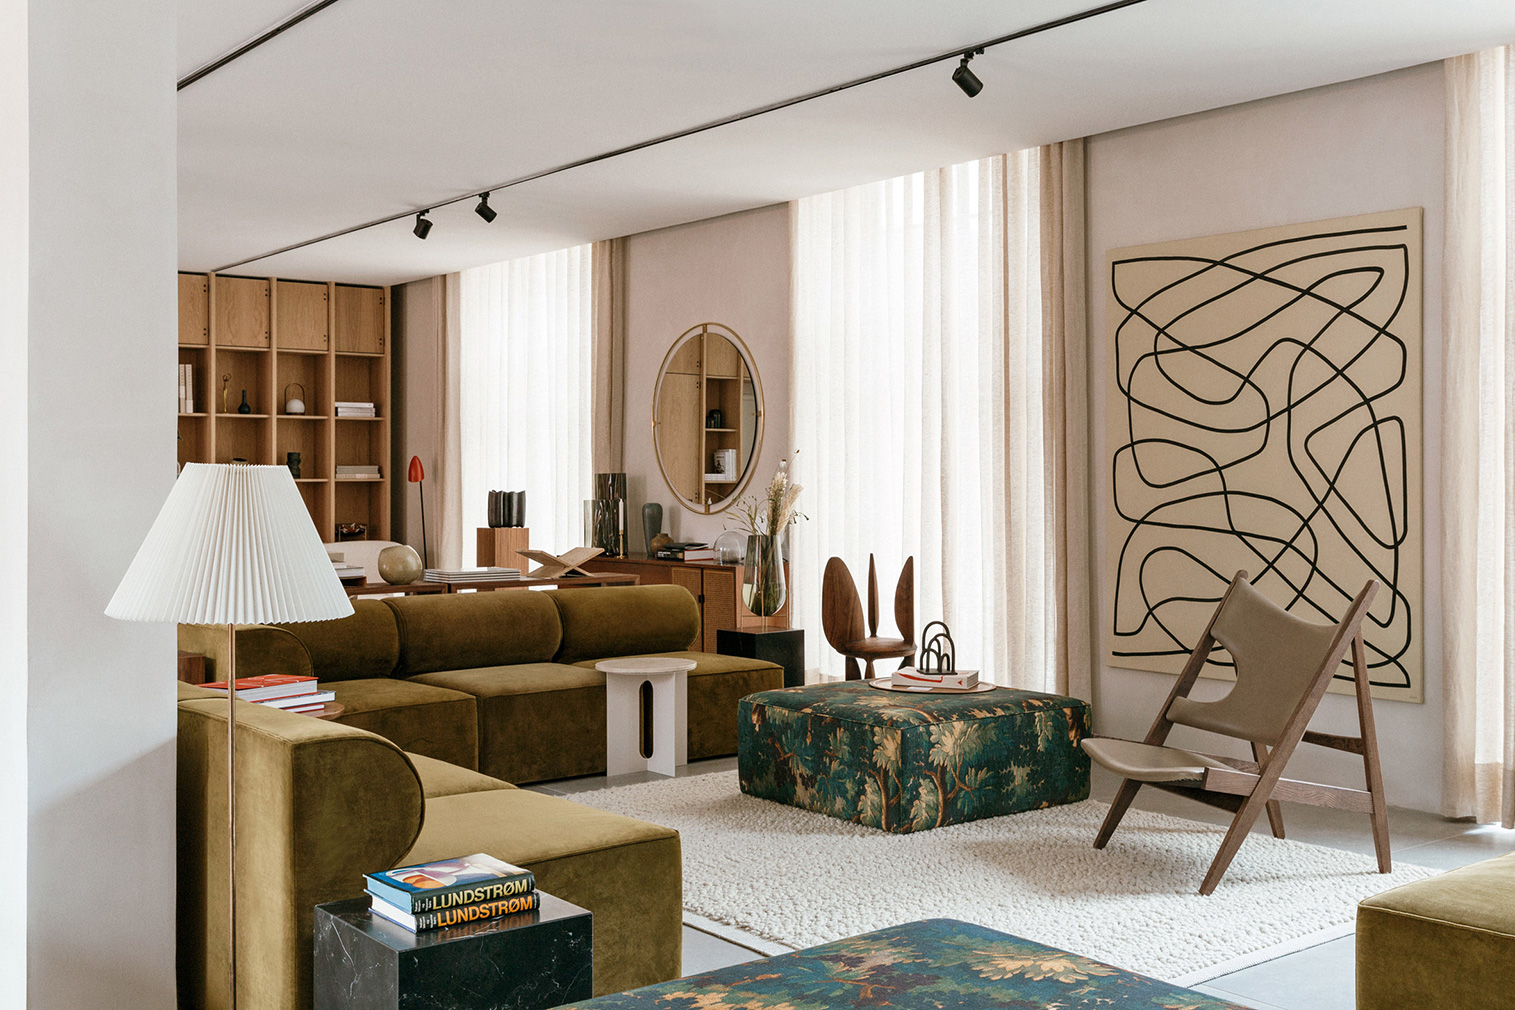 You can stay overnight in Menu's new Copenhagen showroom